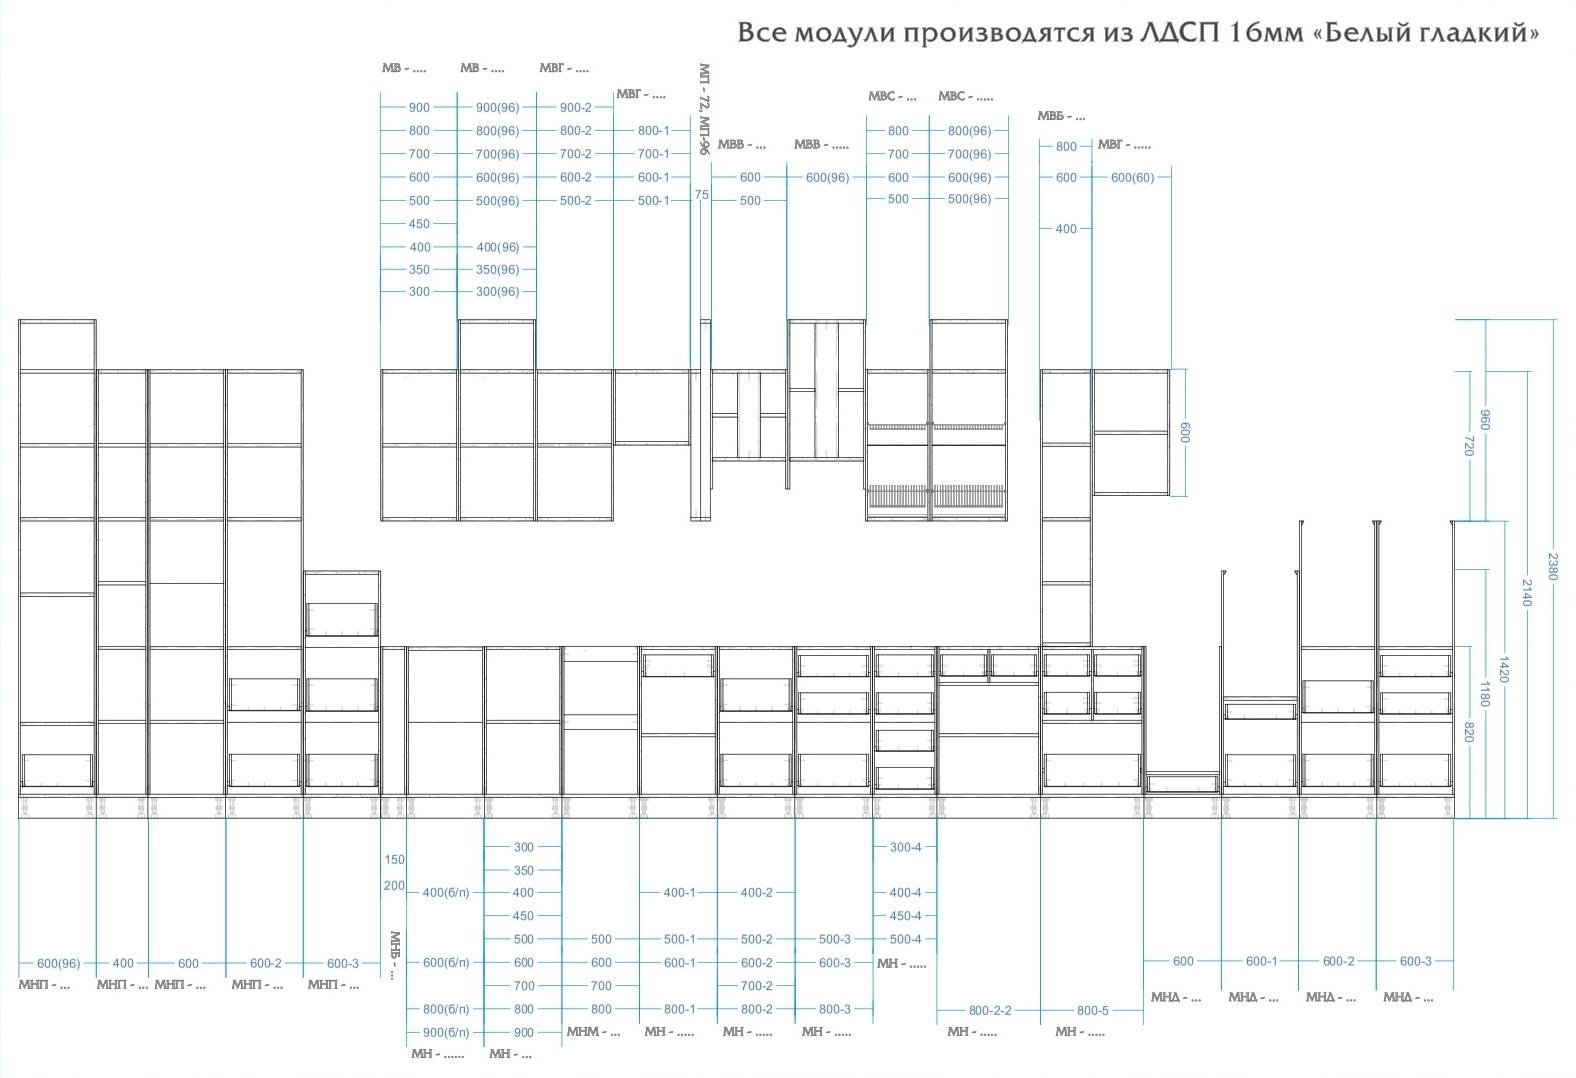 Все модули производятся из ЛДСП 16мм